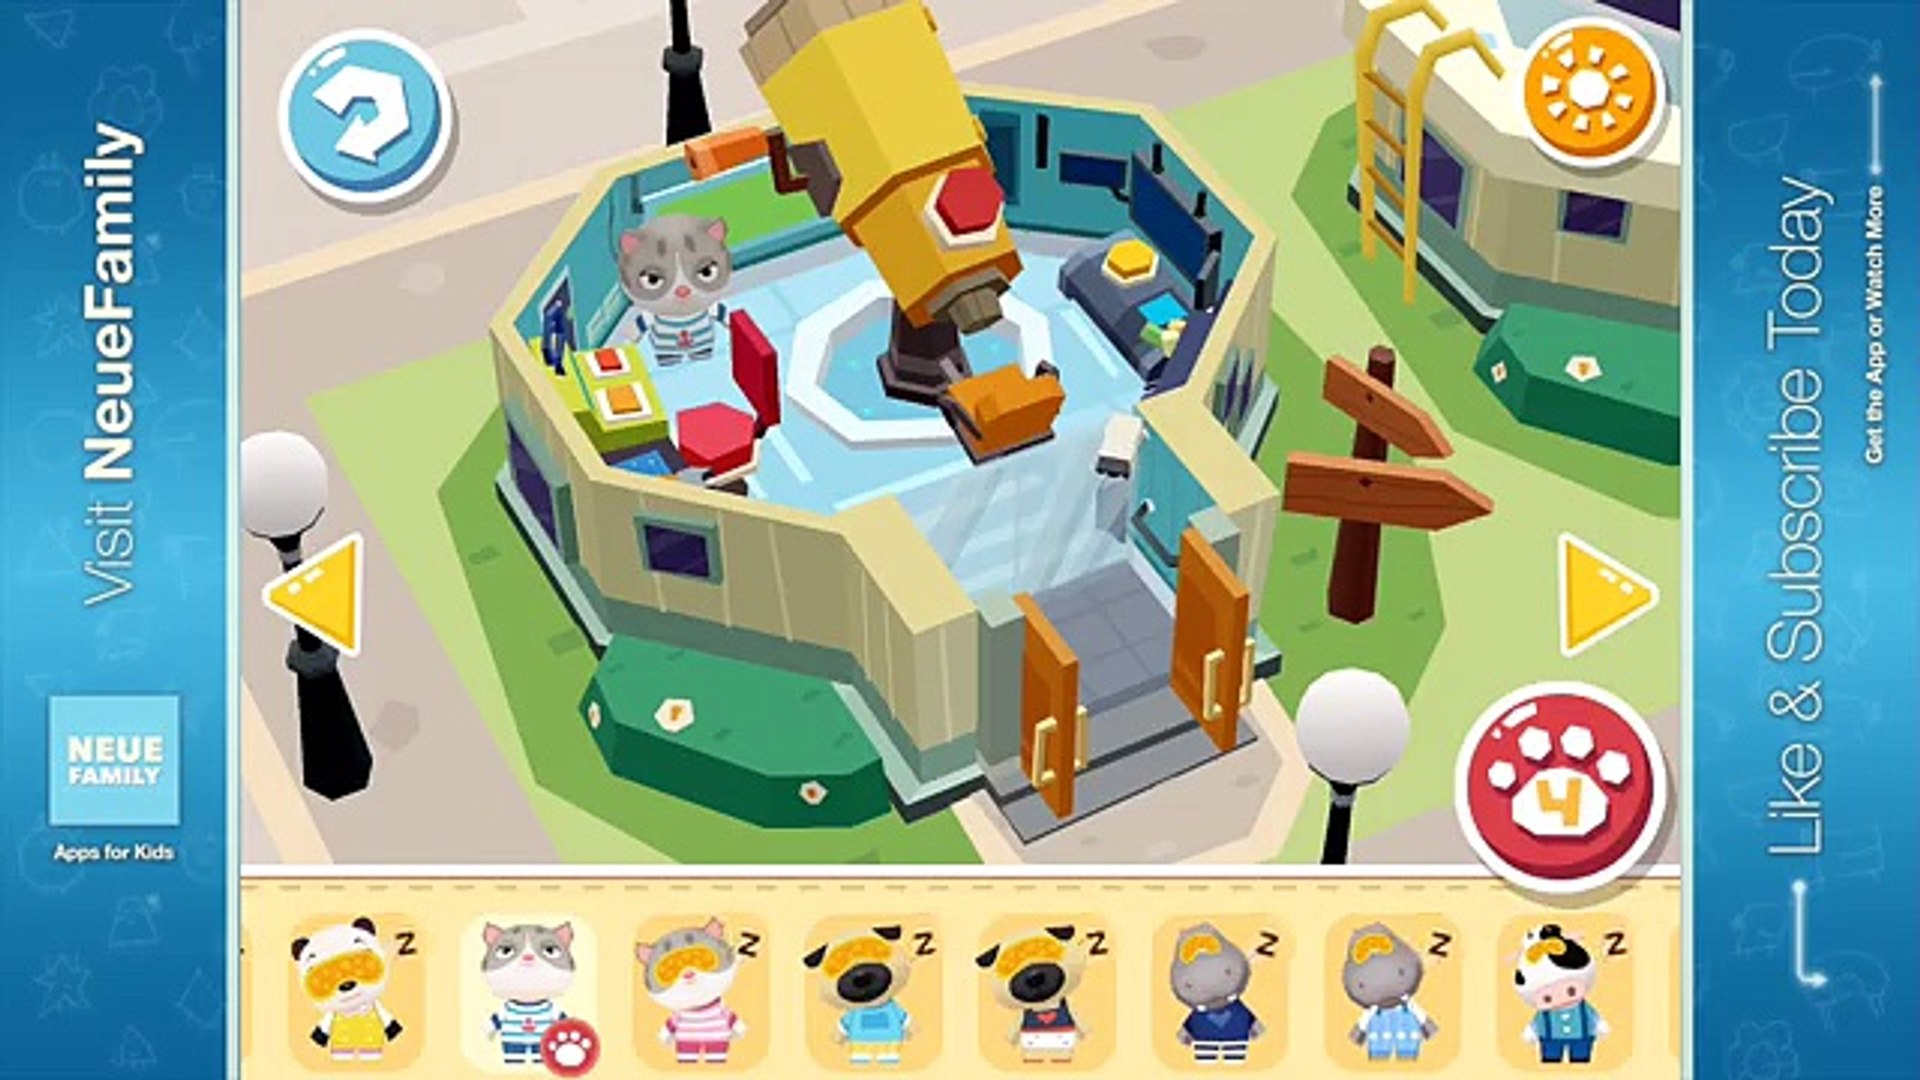 Hoopa City 2: Activity App for Kids